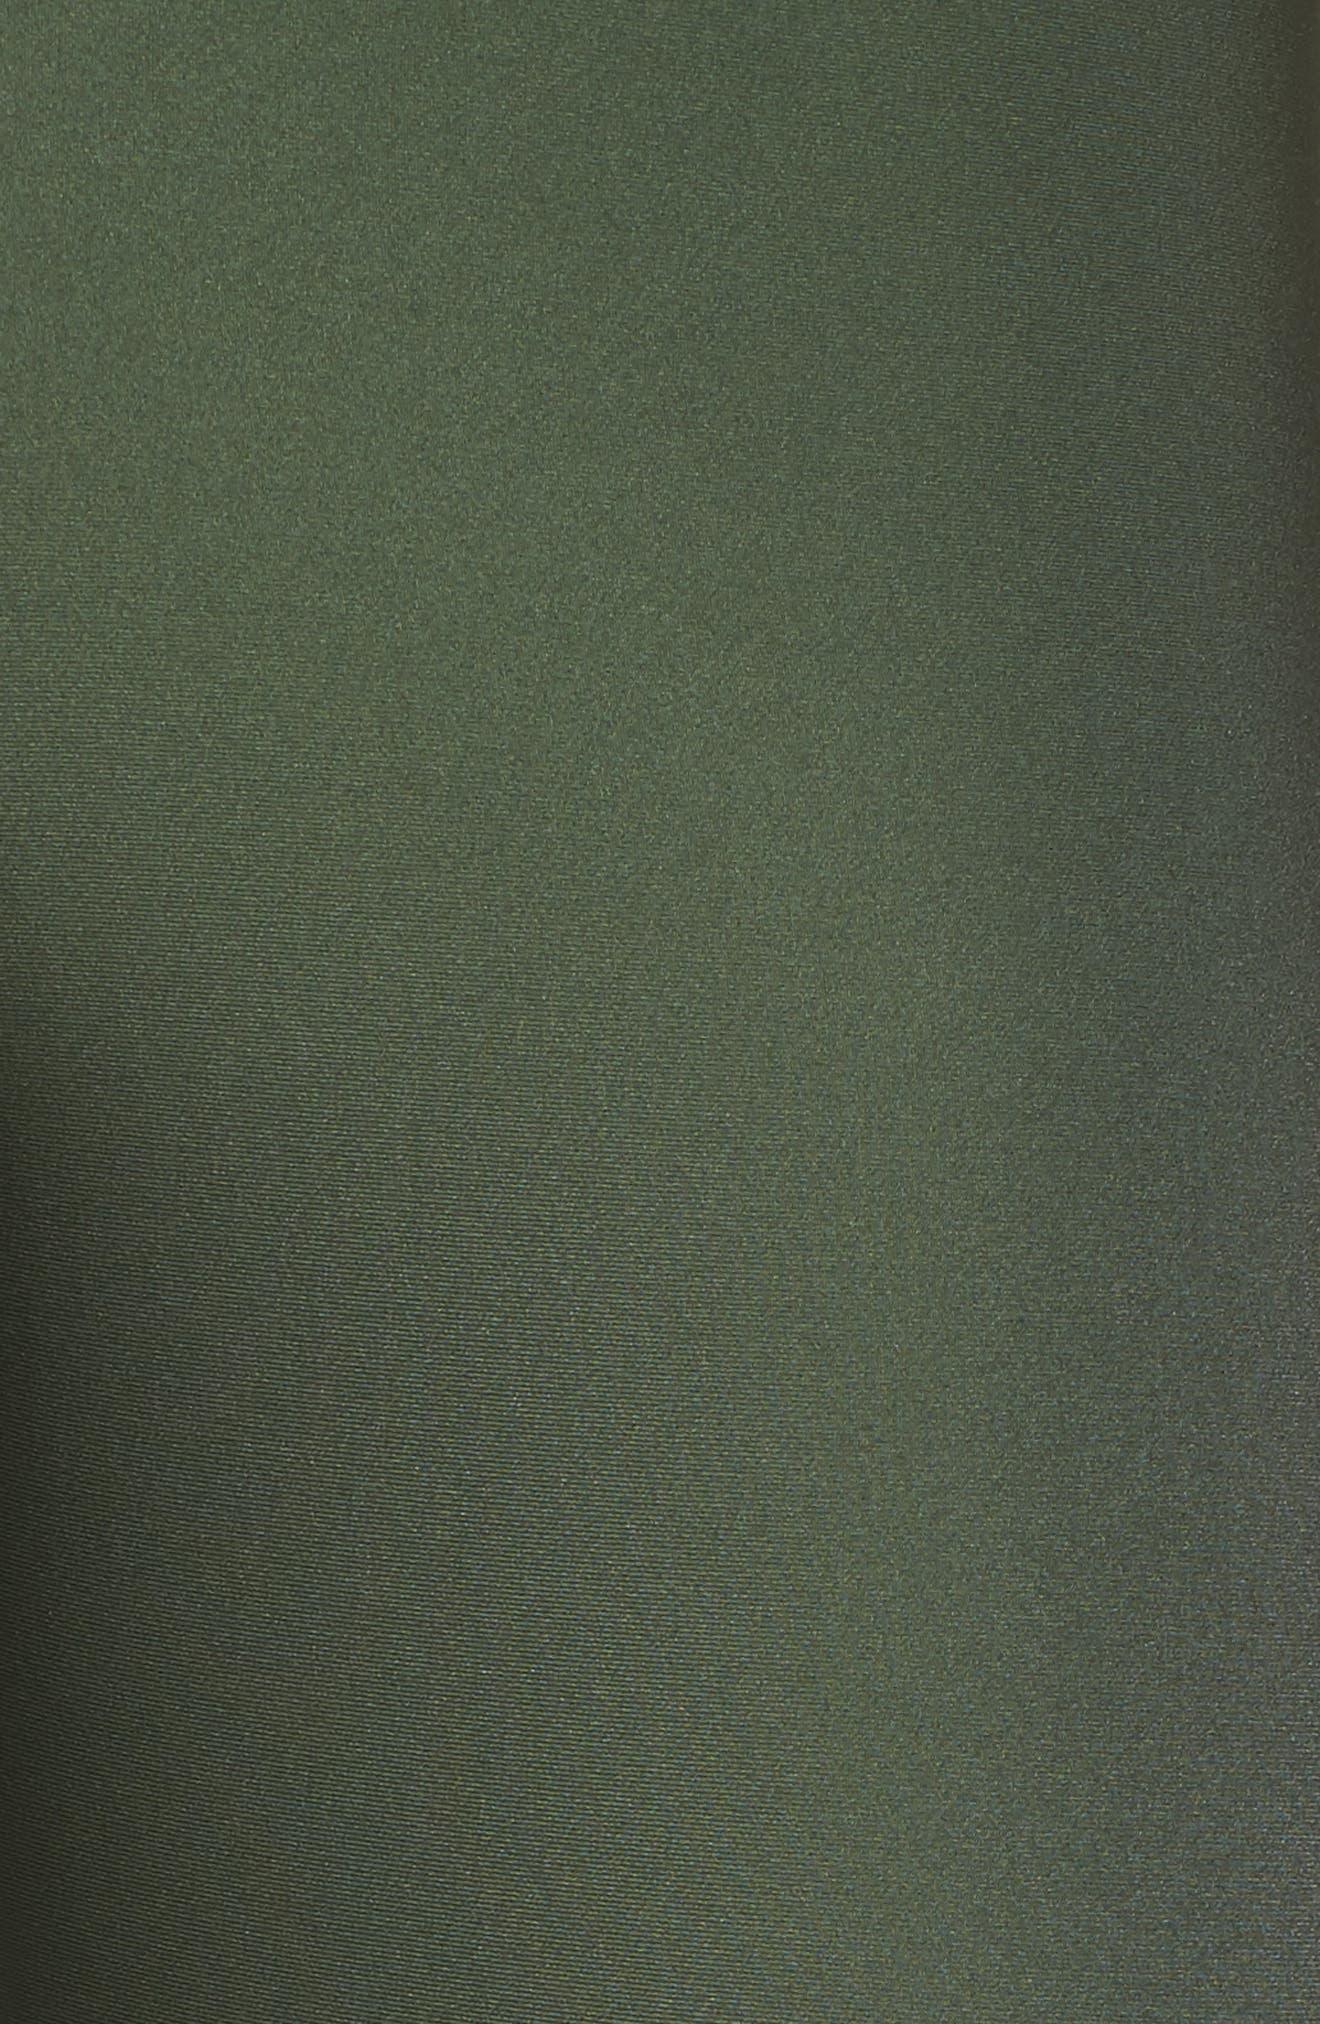 Ultra Luster Leggings,                             Alternate thumbnail 6, color,                             Army Green Beetle